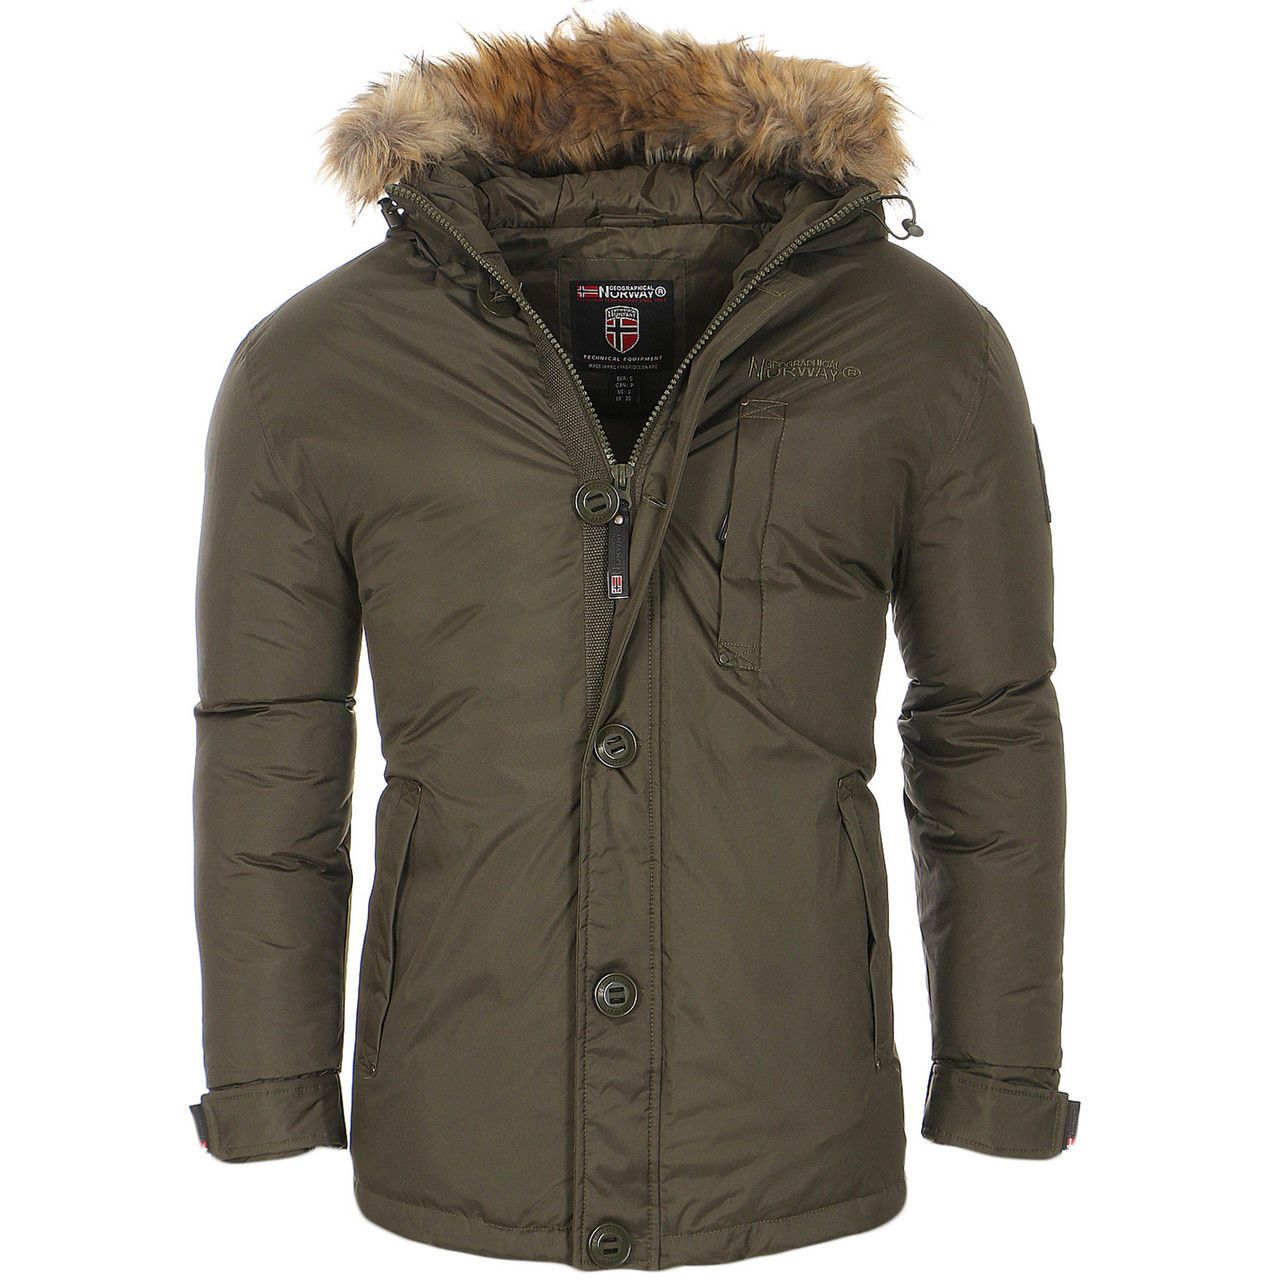 Carhartt winterjacke herren ebay